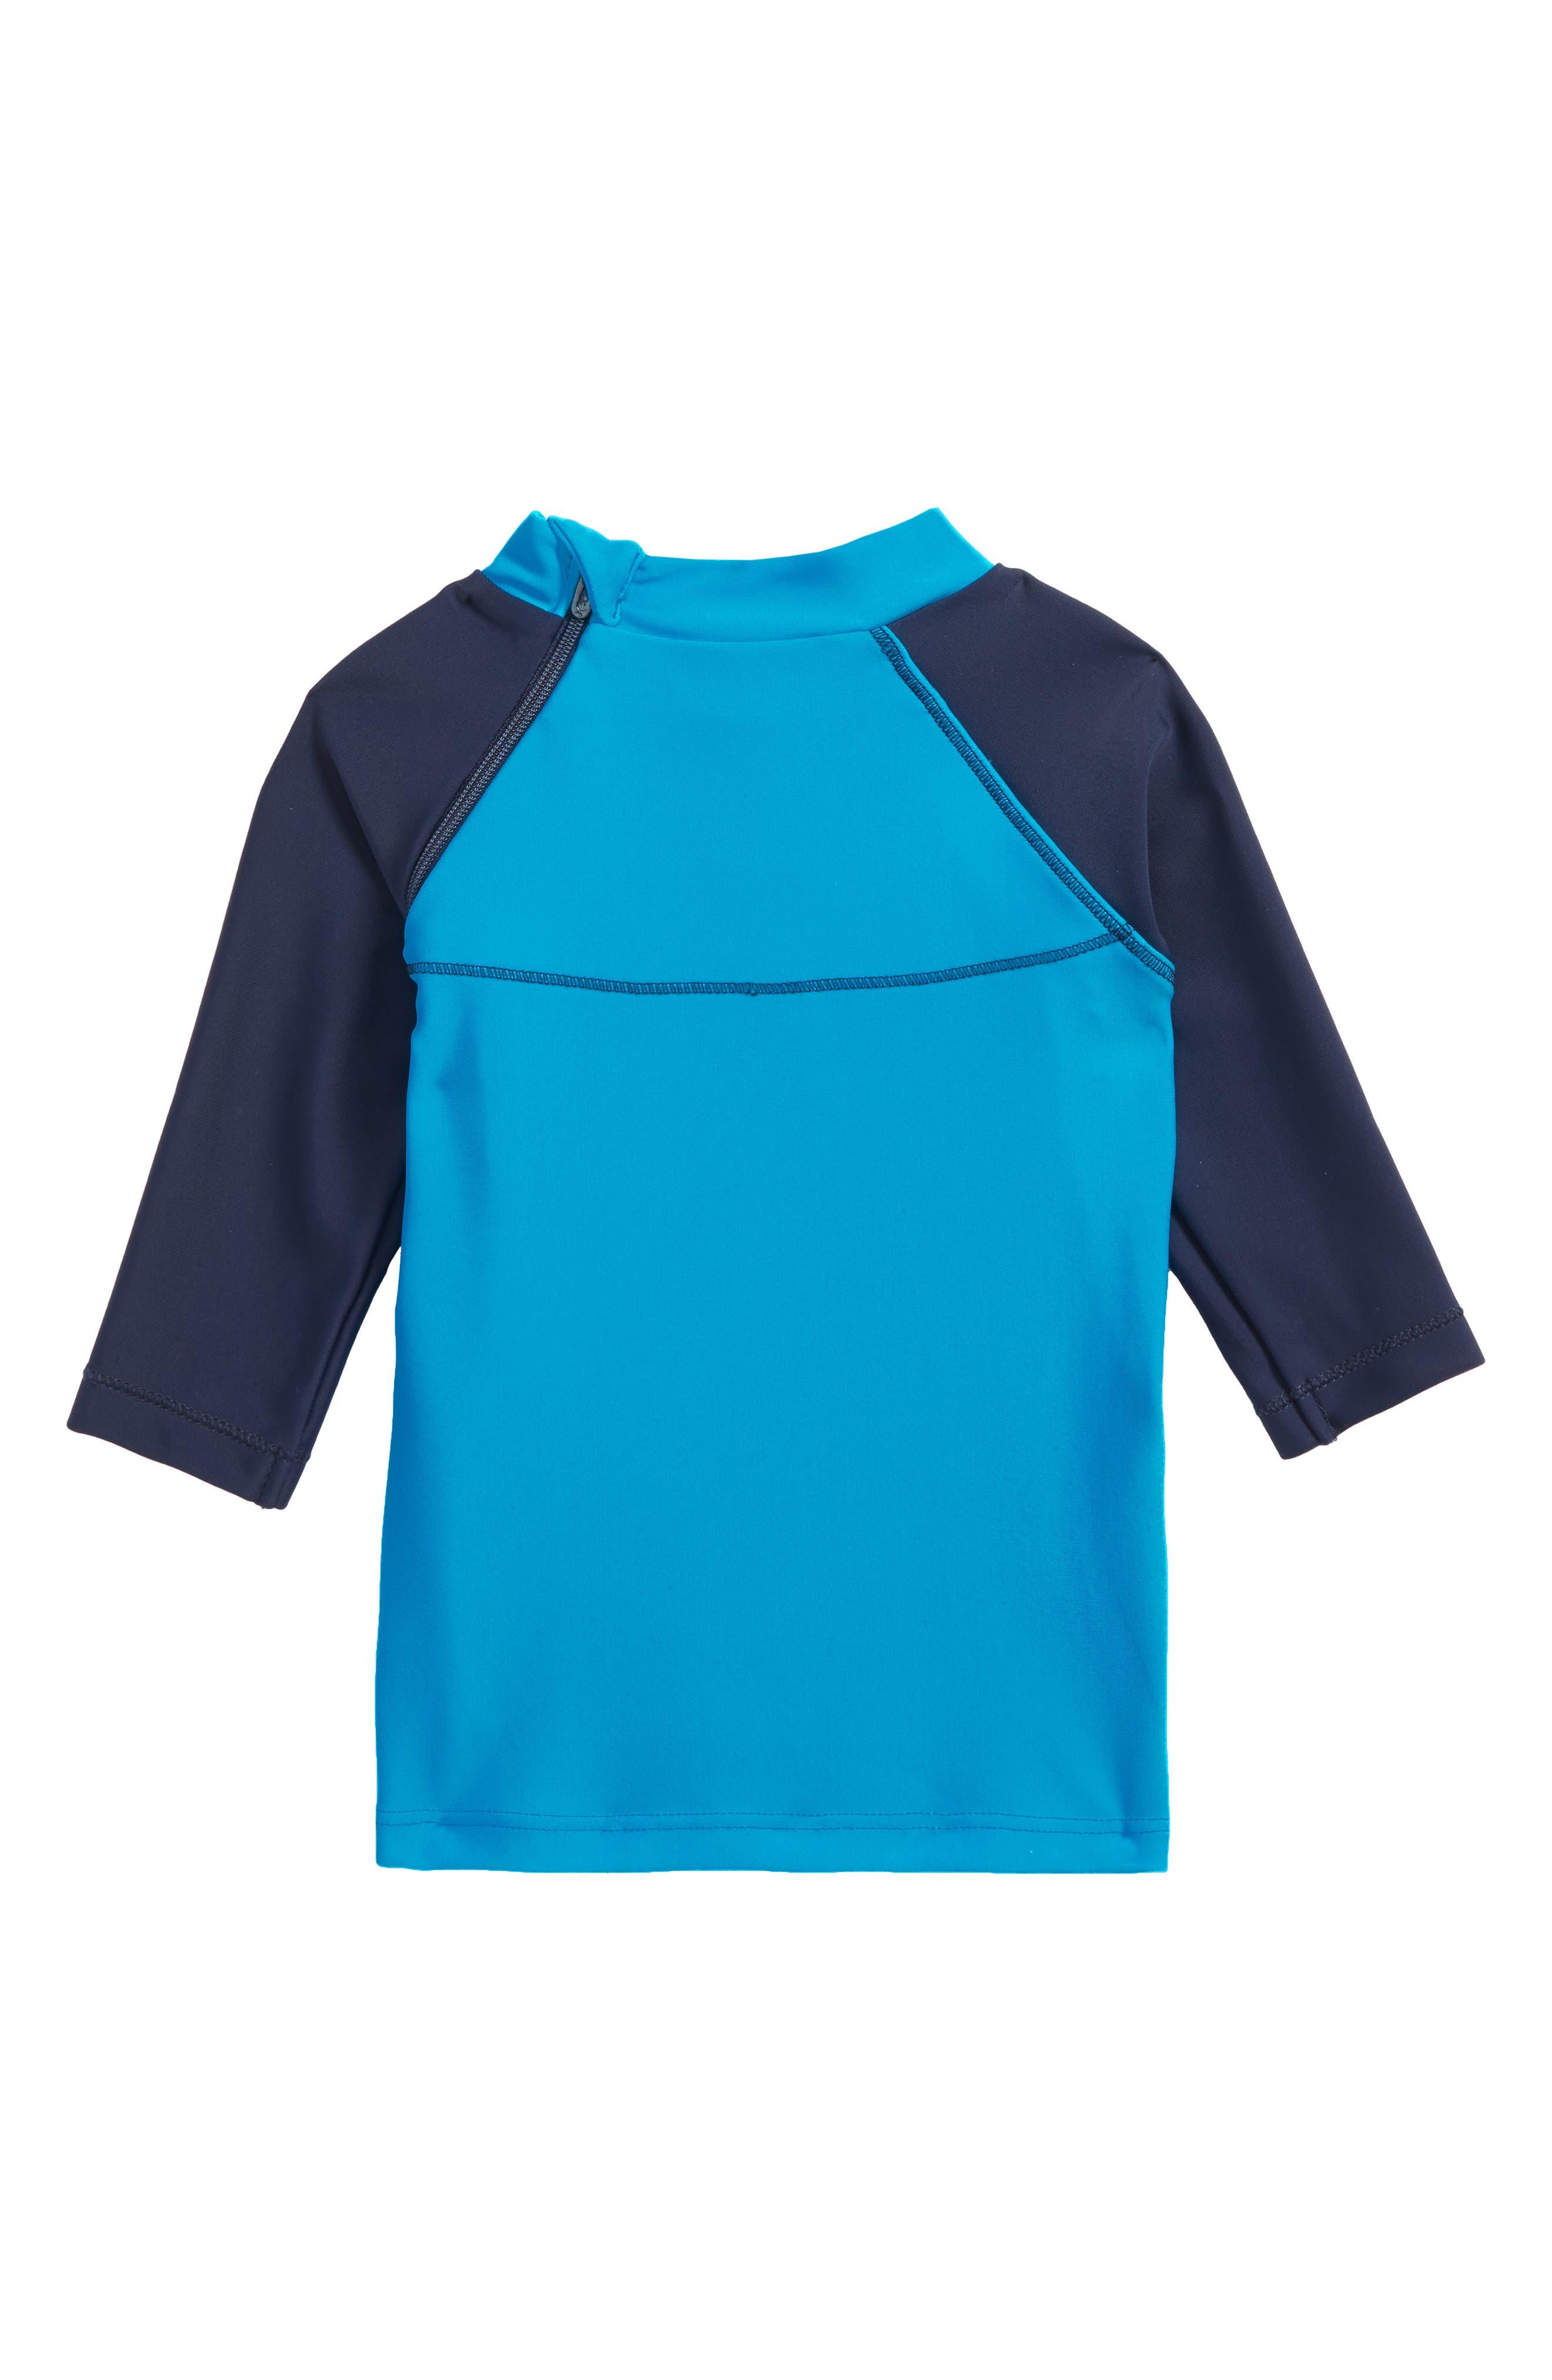 Kids\' Apparel: T-Shirts, Jeans, Pants & Hoodies   Nordstrom